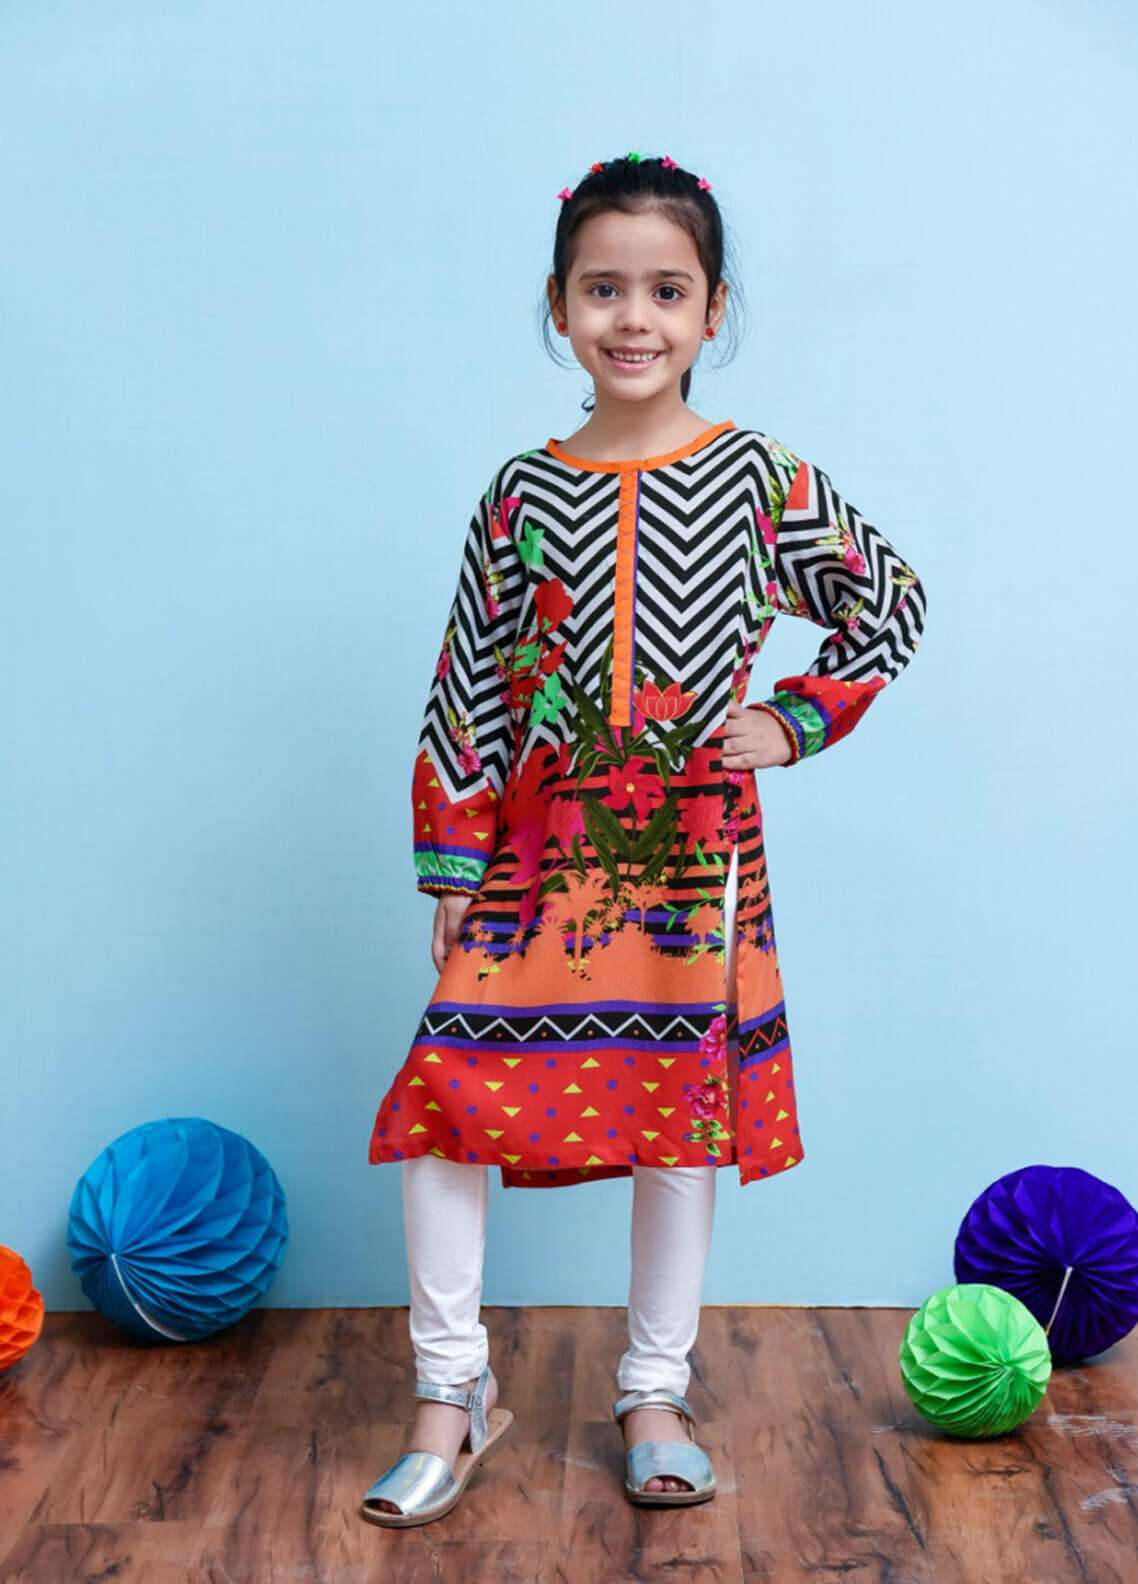 Ochre Cambric Printed Girls Tops - Multi OPL 14